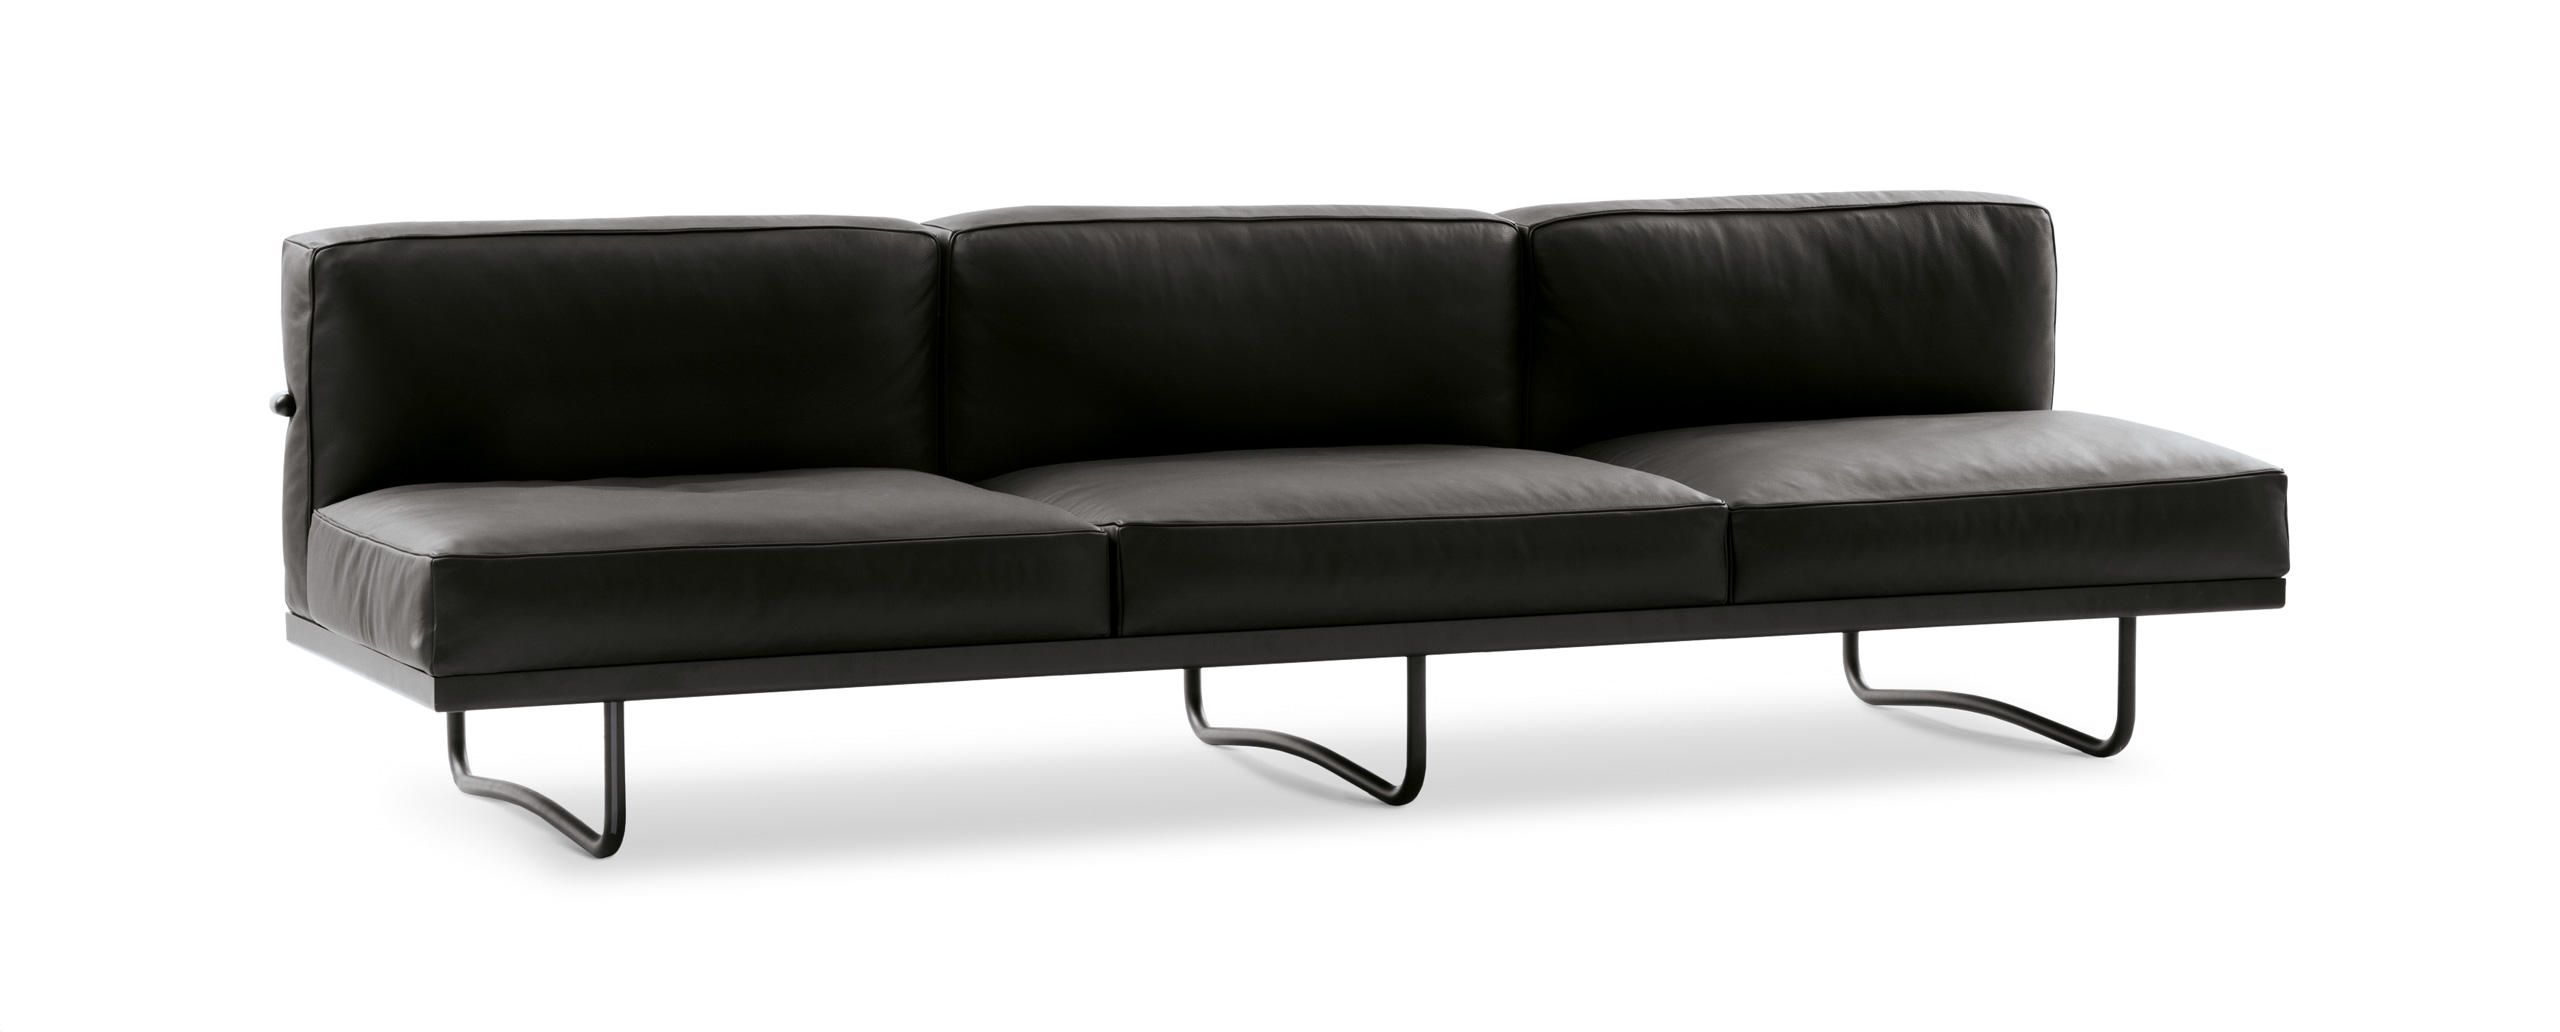 LC5 Le Corbusier, Jeanneret, Perriand Cassina Sofa